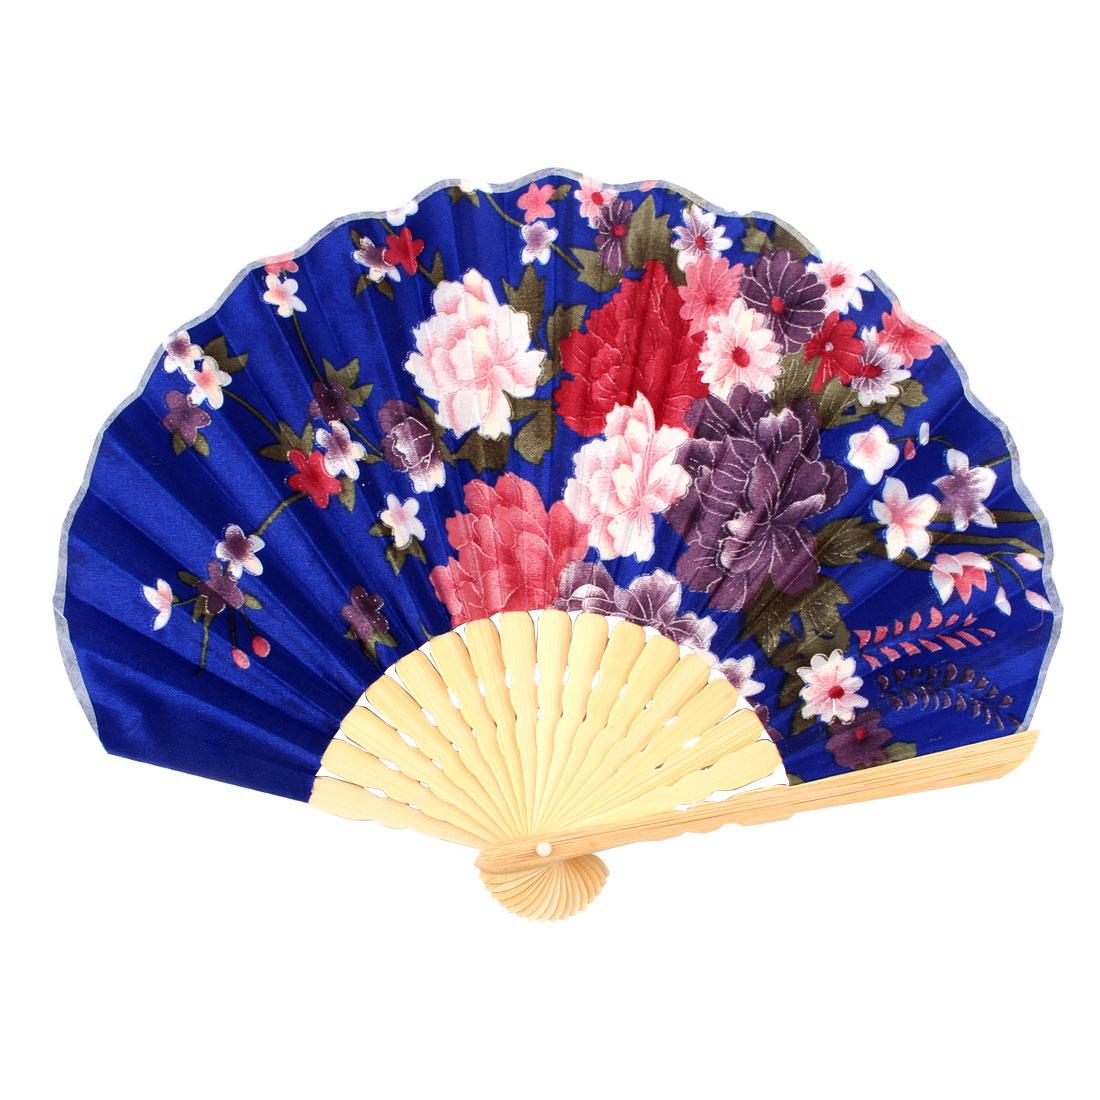 Ladies Summer Blossom Printed Hand-held Folding Dancing Hand Fan Craft